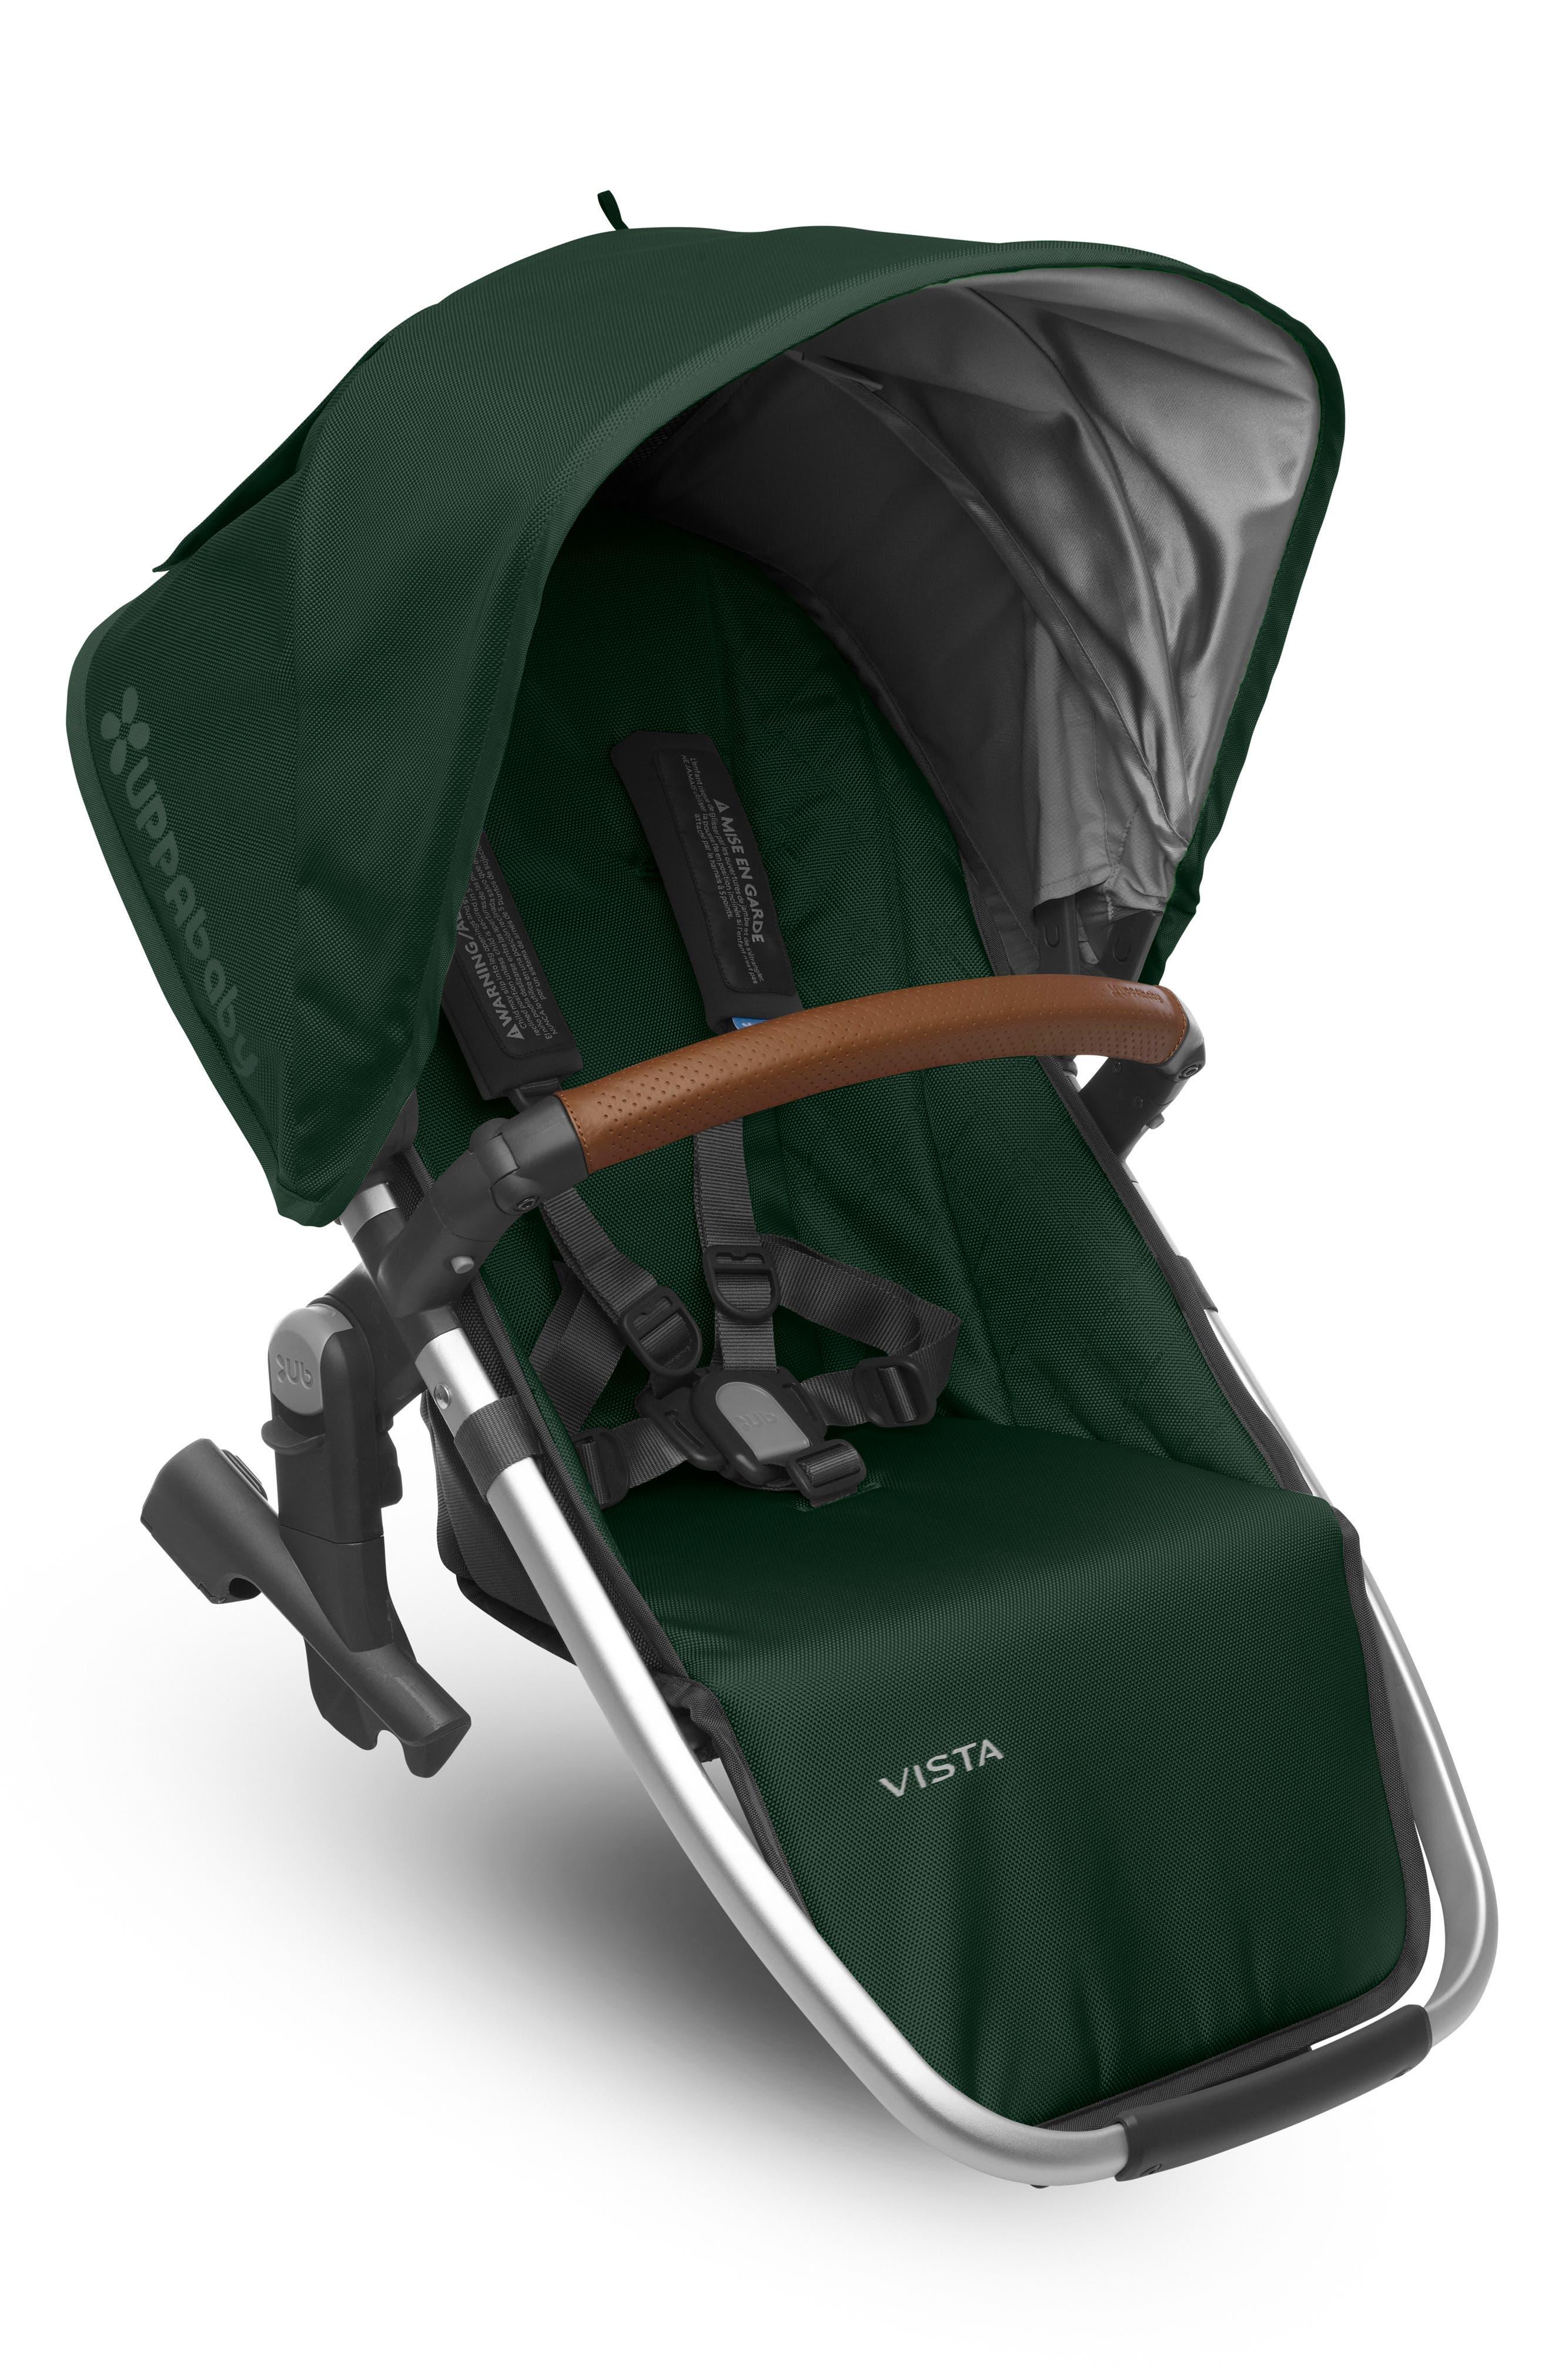 VISTA Stroller Rumble Seat,                             Main thumbnail 1, color,                             Hunter/ Silver